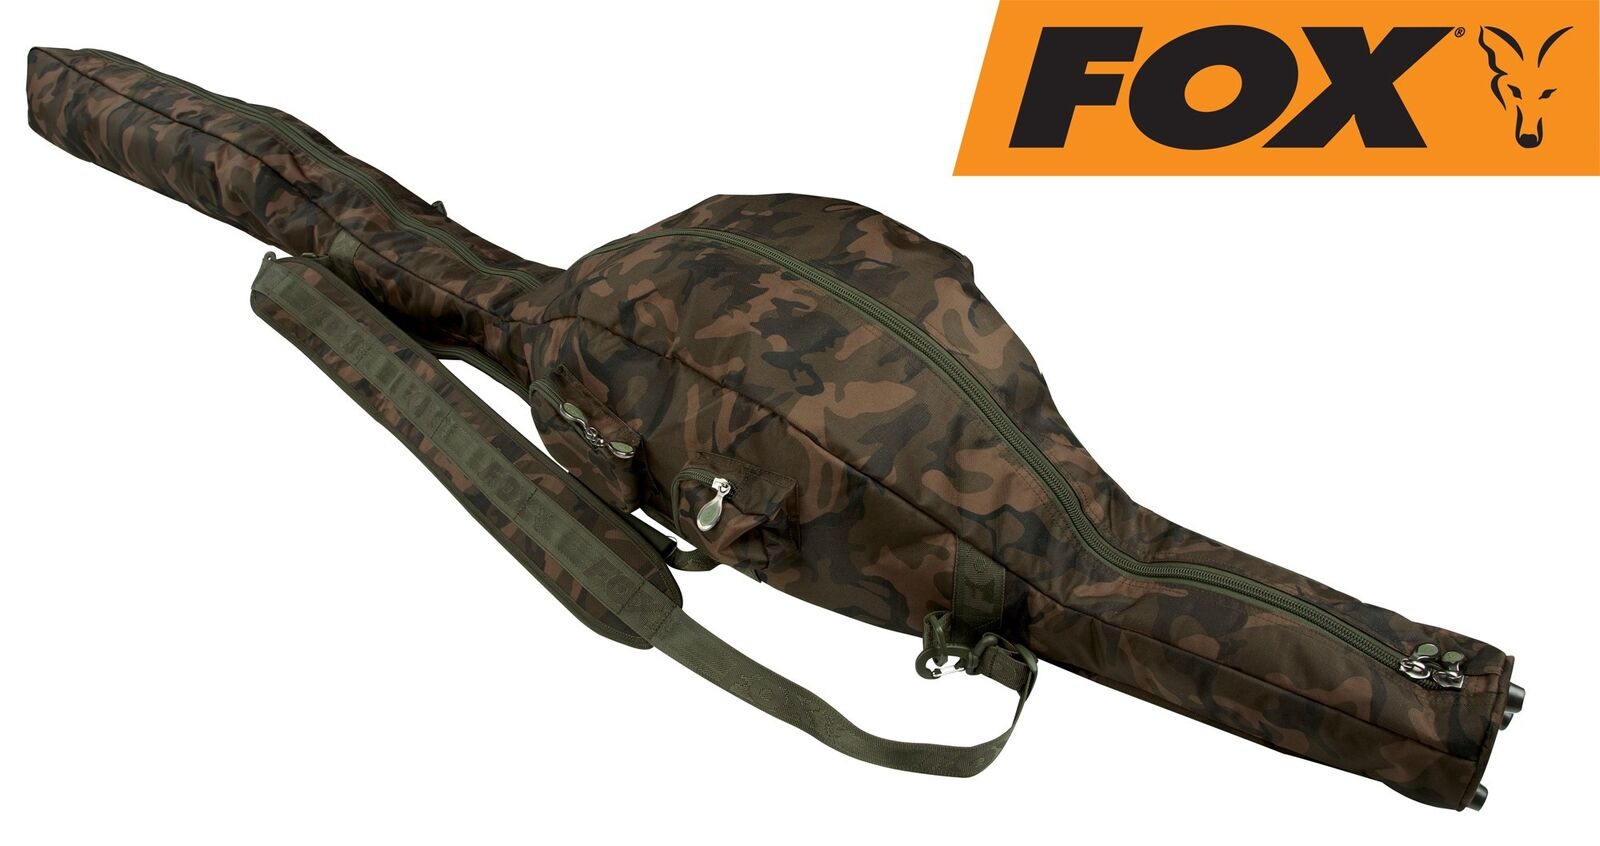 Fox Camolite Tri Tri Tri Sleeve 12ft Rutentasche, Rutenfutteral für Karpfenruten b05119